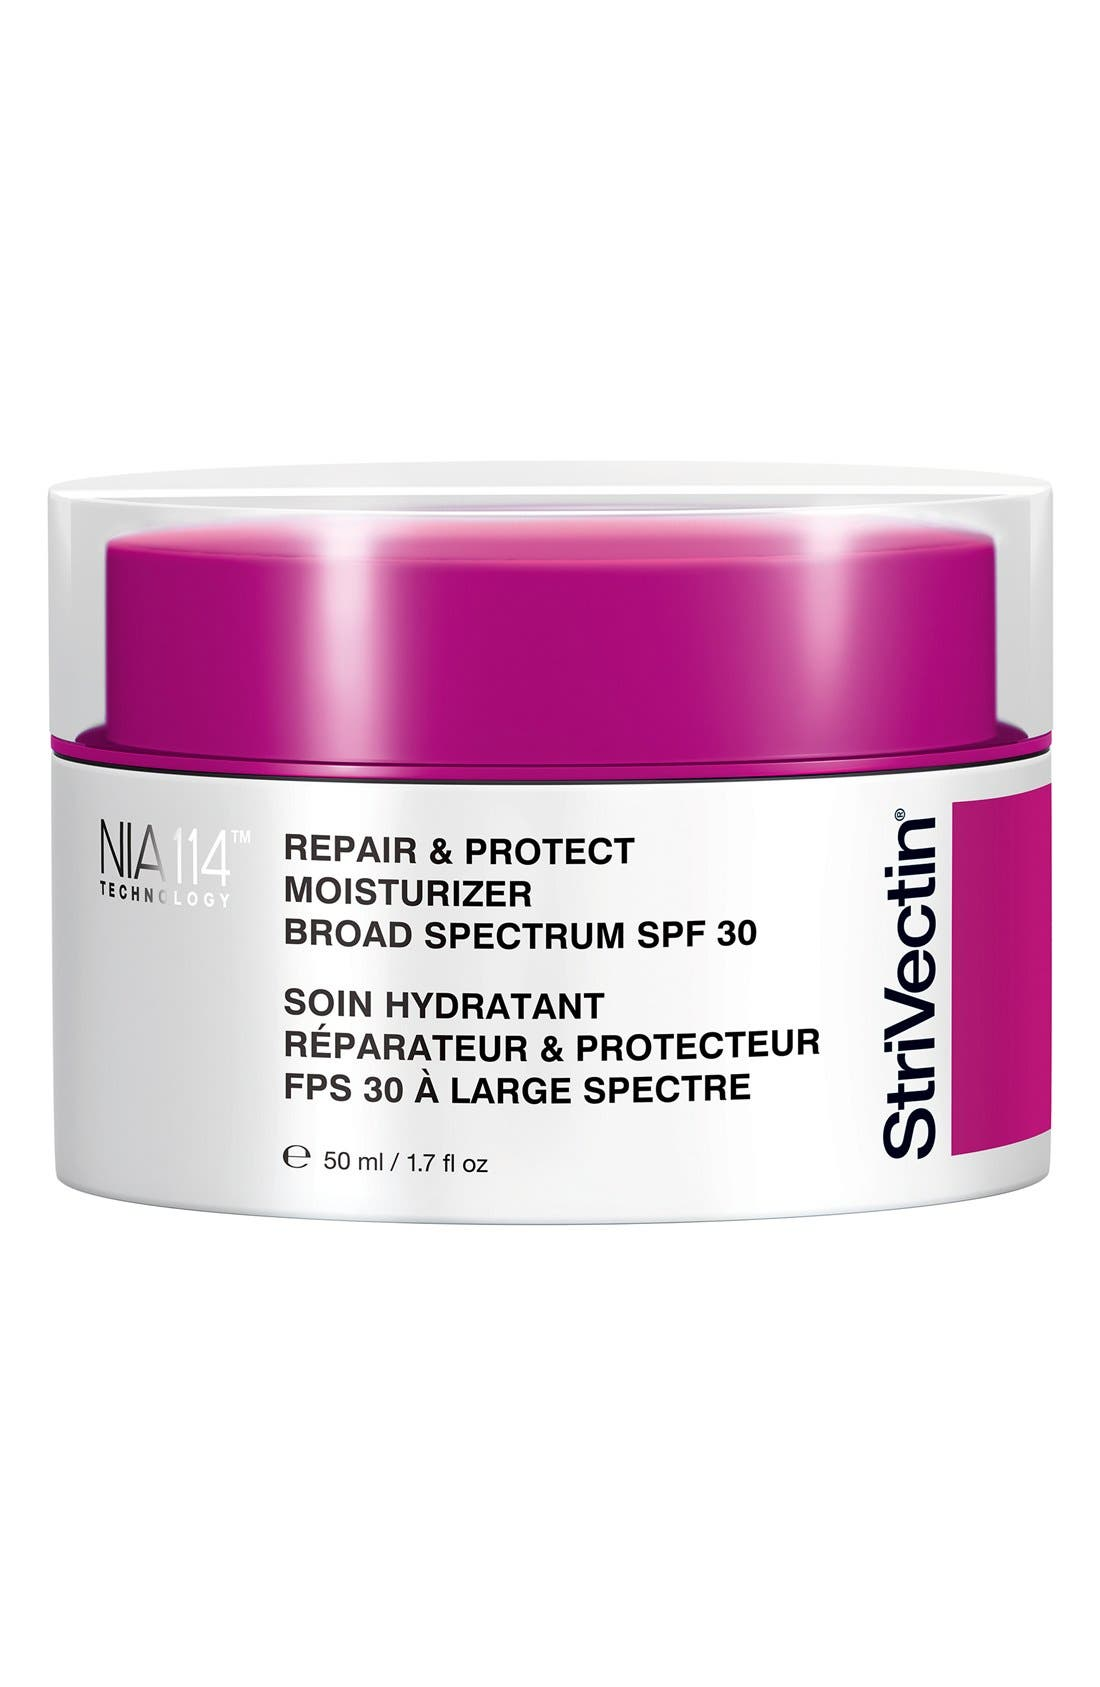 Repair & Protect Moisturizer Broad Spectrum SPF 30,                             Main thumbnail 1, color,